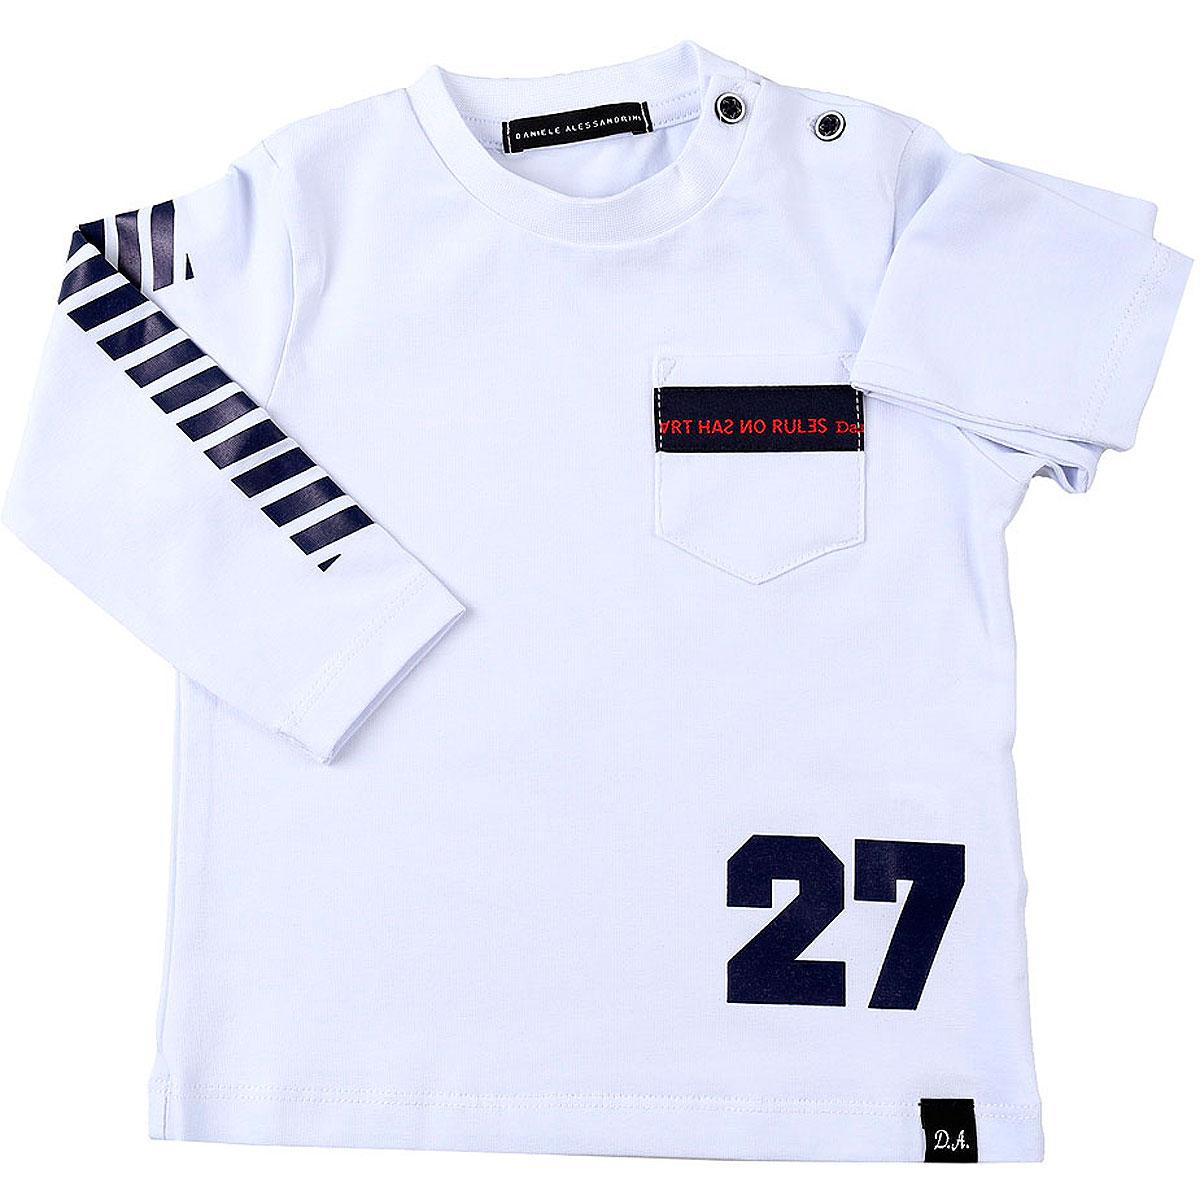 Daniele Alessandrini Baby T-Shirt for Boys On Sale, White, Cotton, 2019, 12 M 18M 2Y 3Y 6M 9M